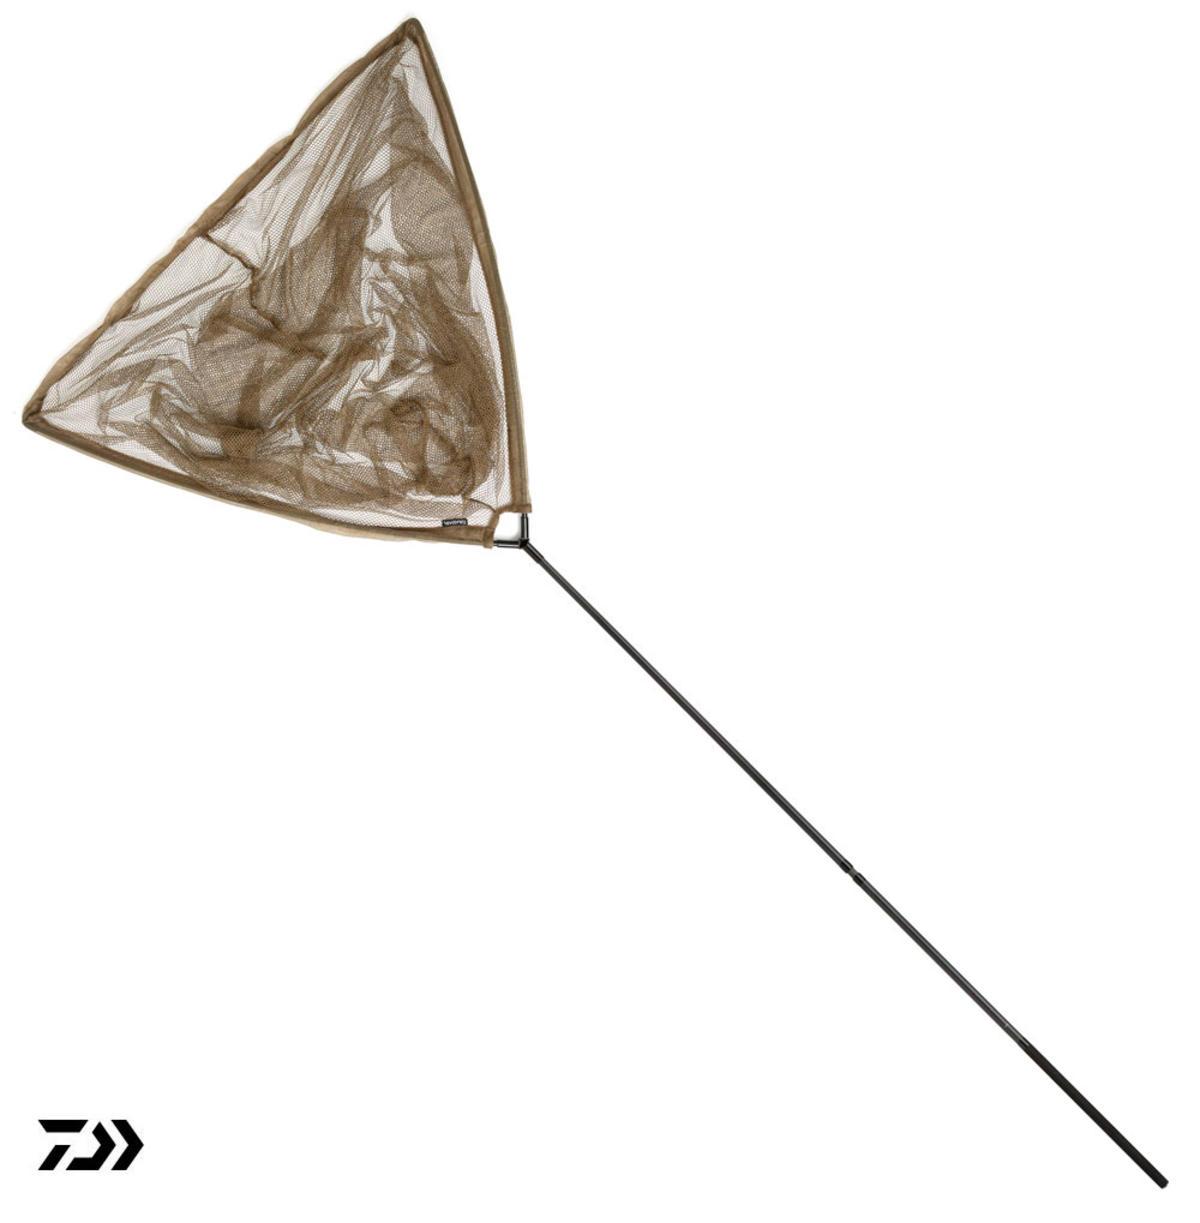 "New Daiwa Crosscast Landing Net & Handle - 42"" / 1.8m - 2pc - CCLNH1802-AX"